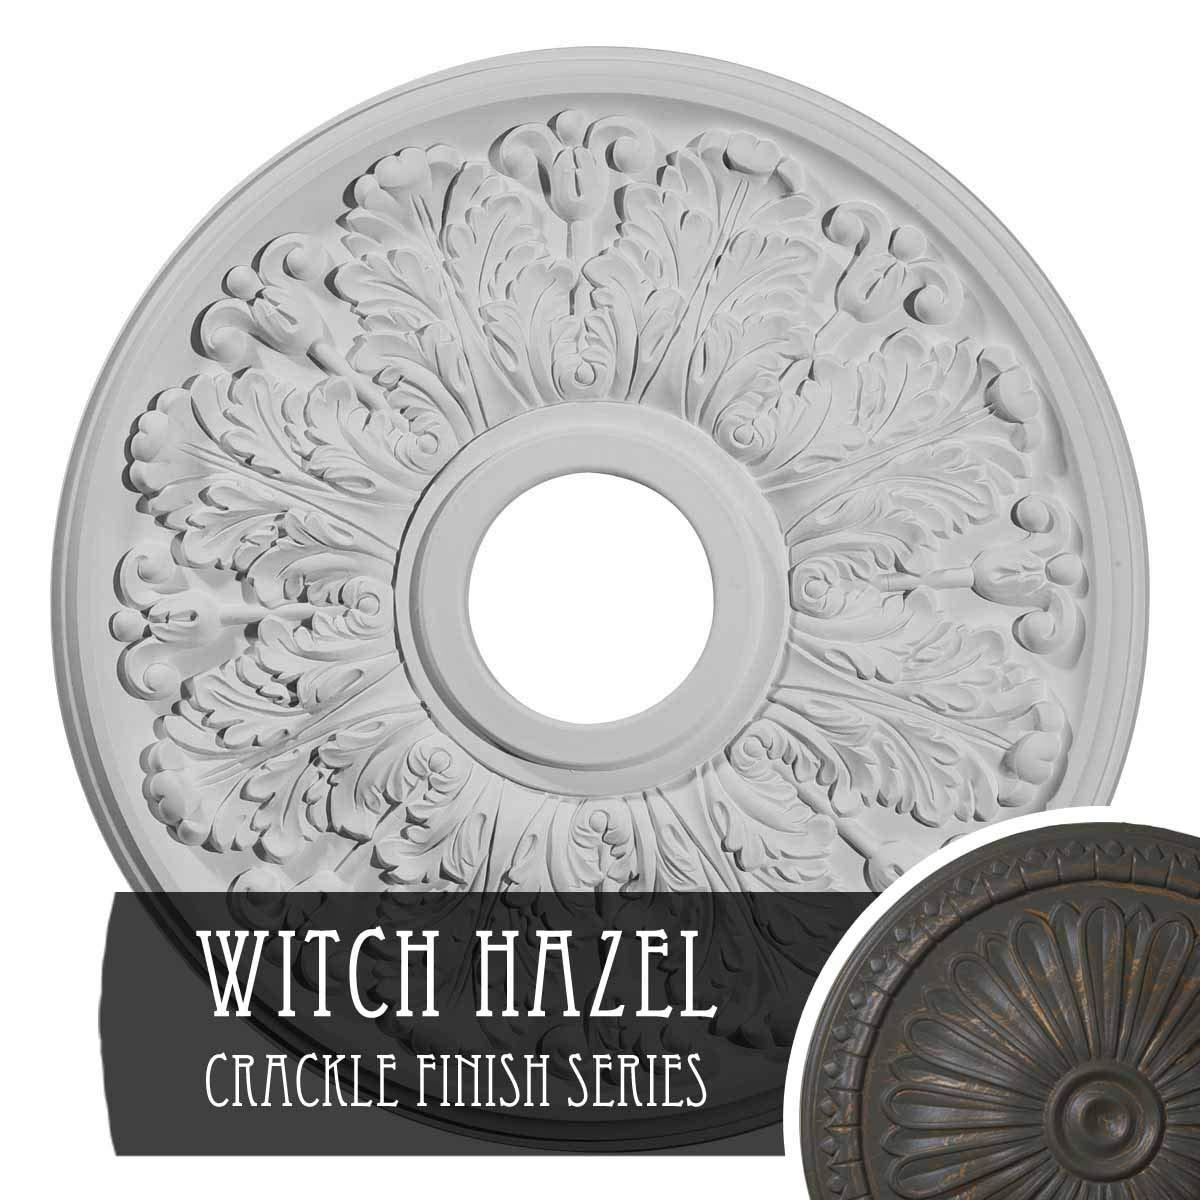 Ekena Millwork CM16APWHC Ceiling Medallion 16 1/2'' OD x 3 ID x 1 1/8'' P Apollo (fits Canopies up to 5 5/8''), Witch Hazel Crackle